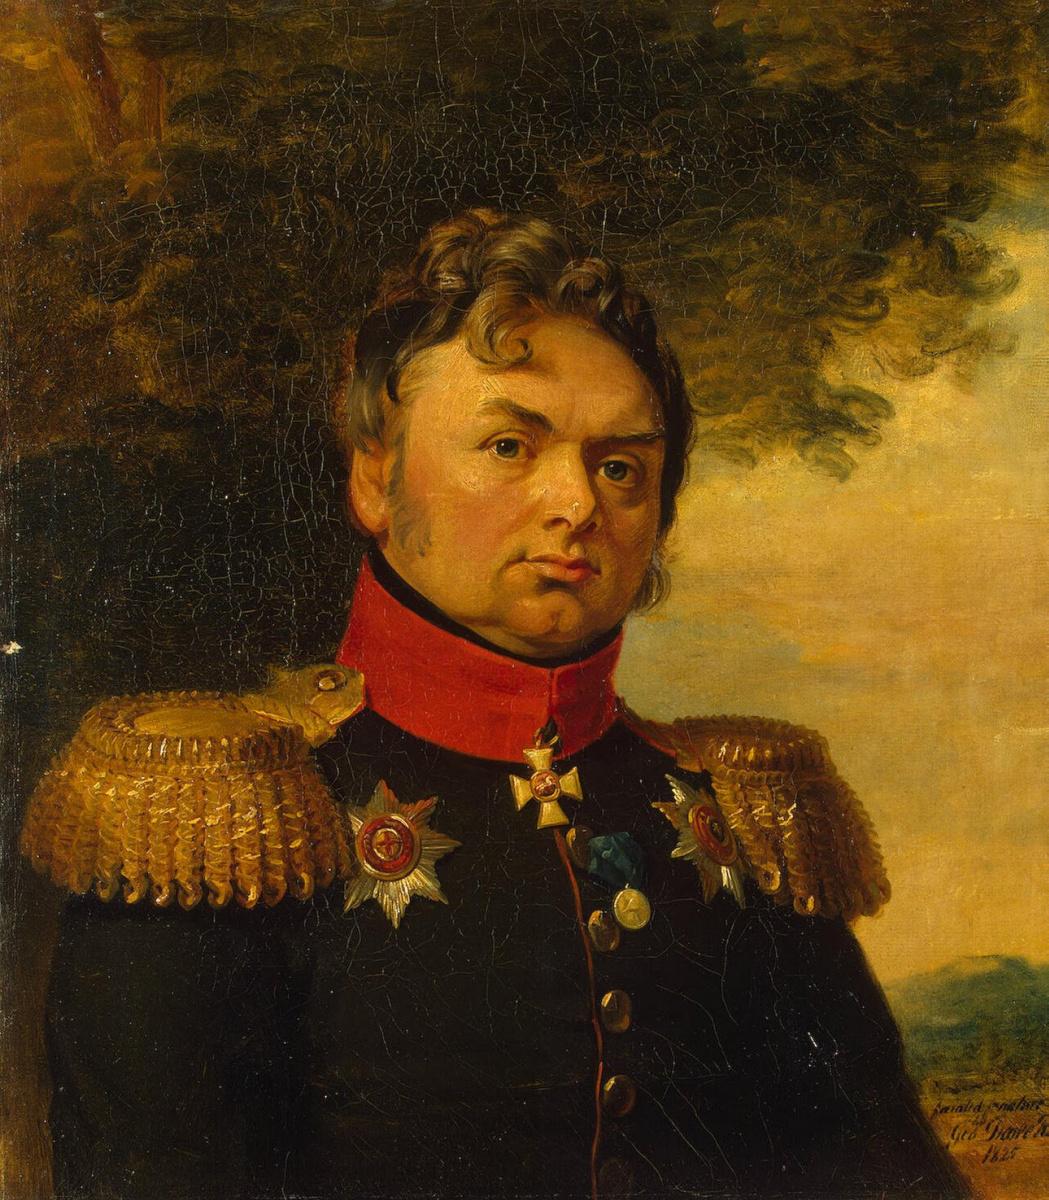 George Dow. Portrait of Pavel Nikolaevich Choglokov